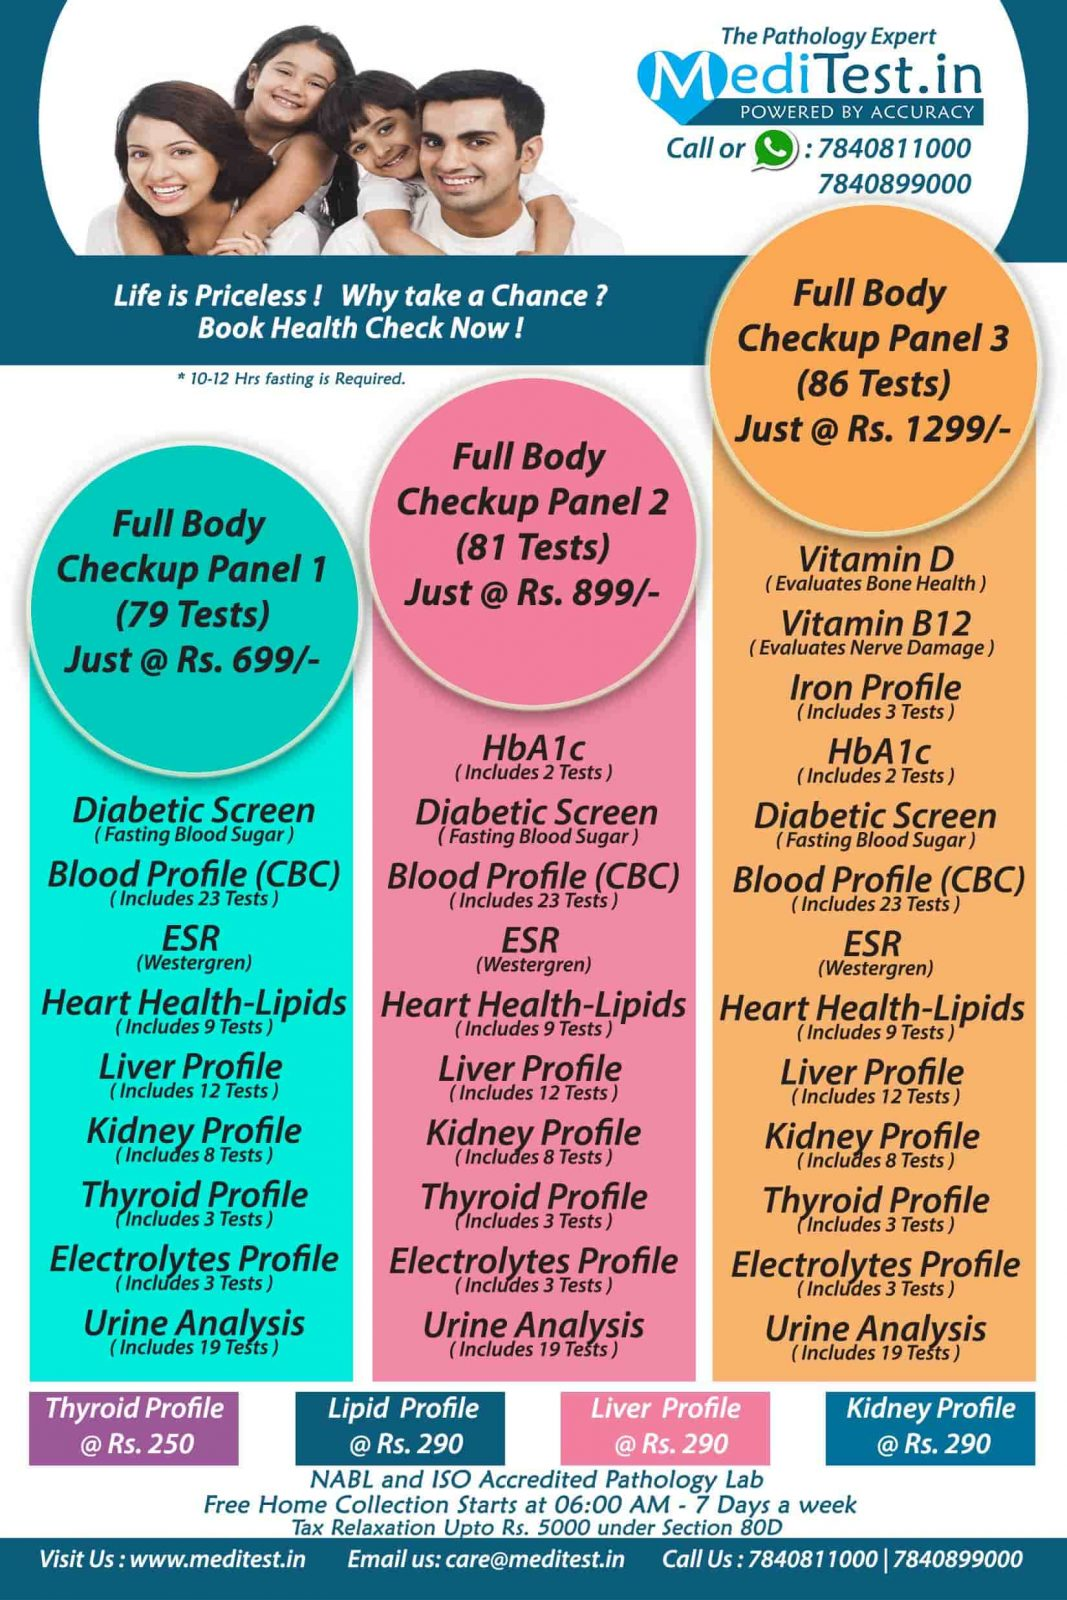 Full Body Checkup